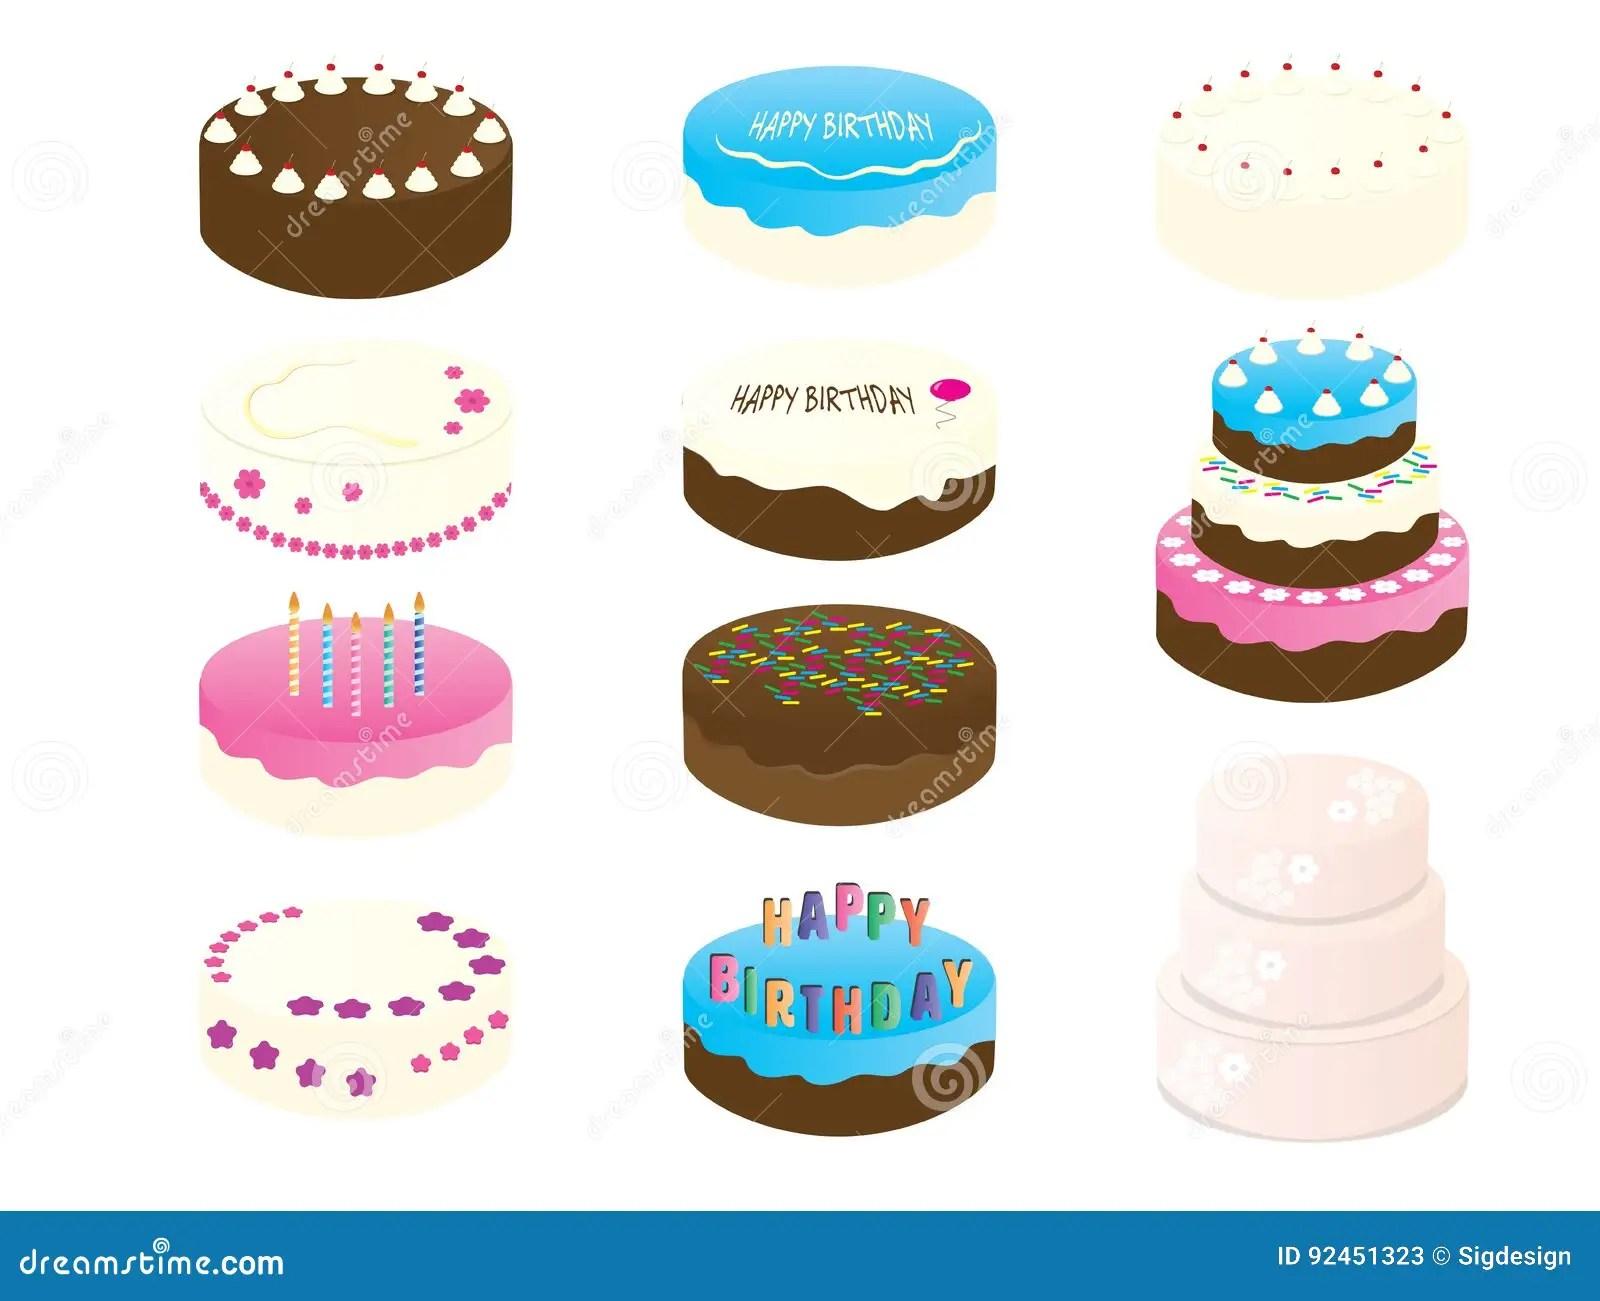 11 Birthday Cake Clip Arts Stock Vector Illustration Of Cakes 92451323